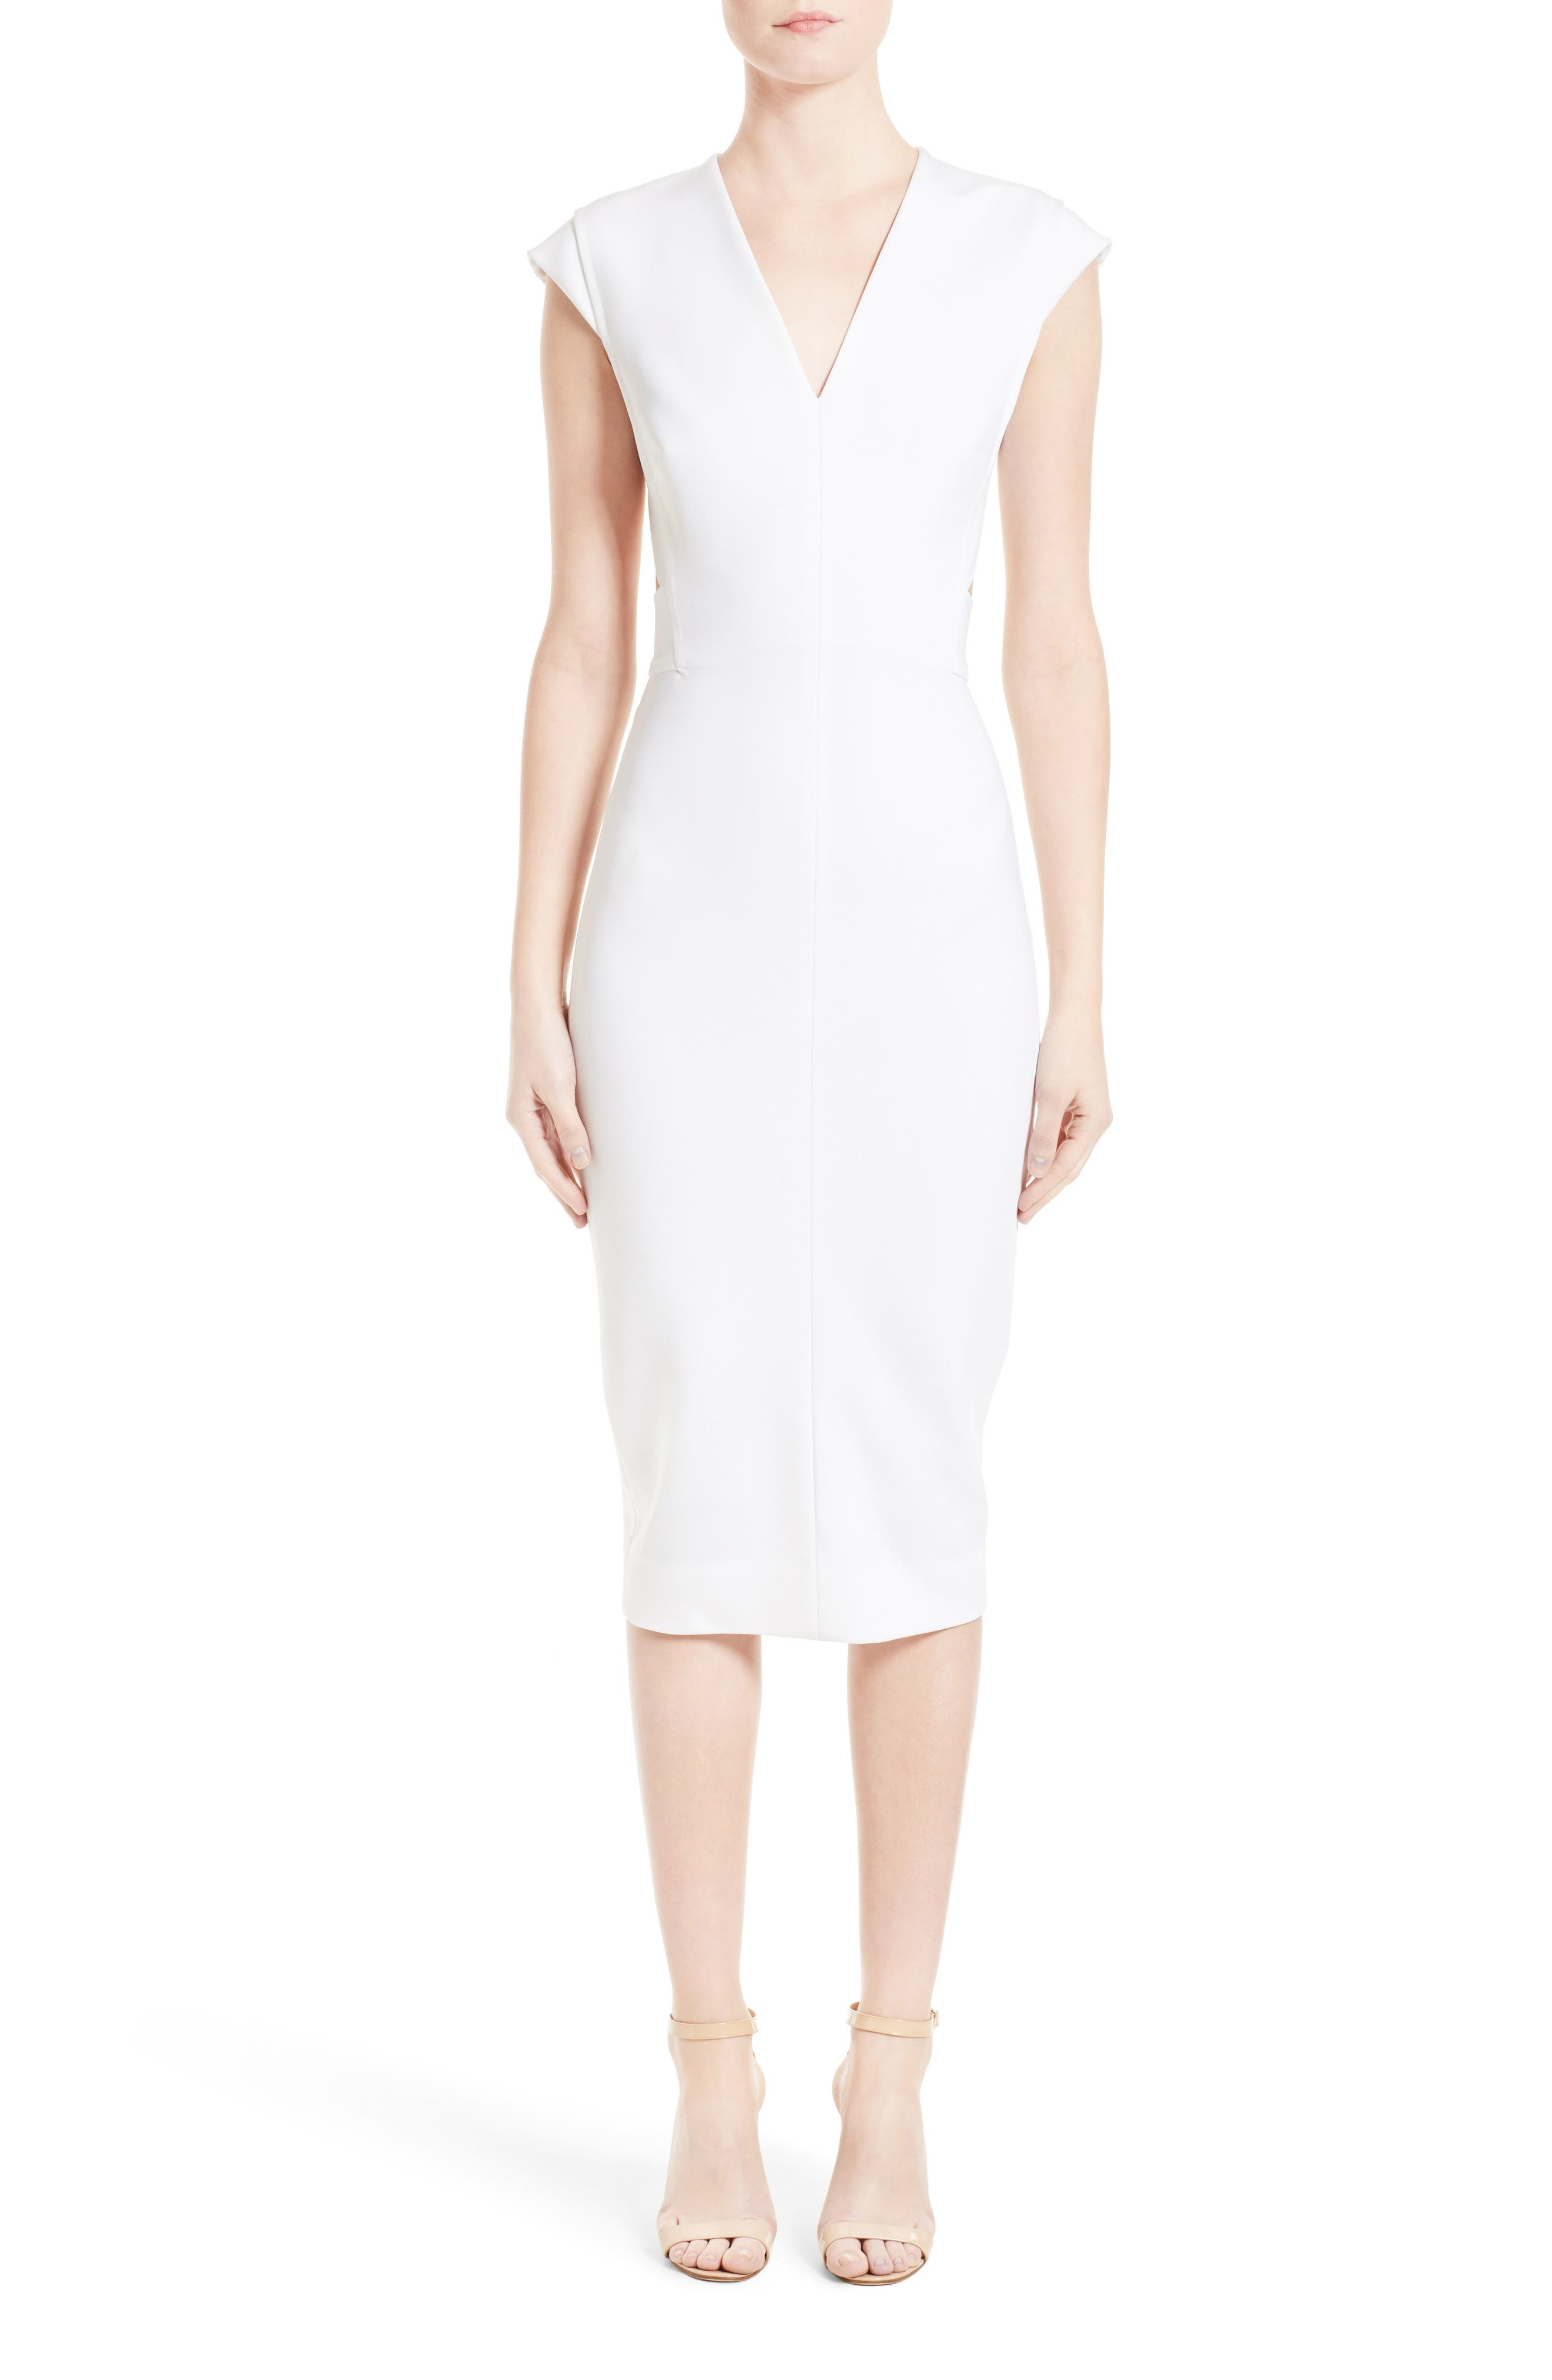 Victoria Beckham Open Back Rib Jersey Dress